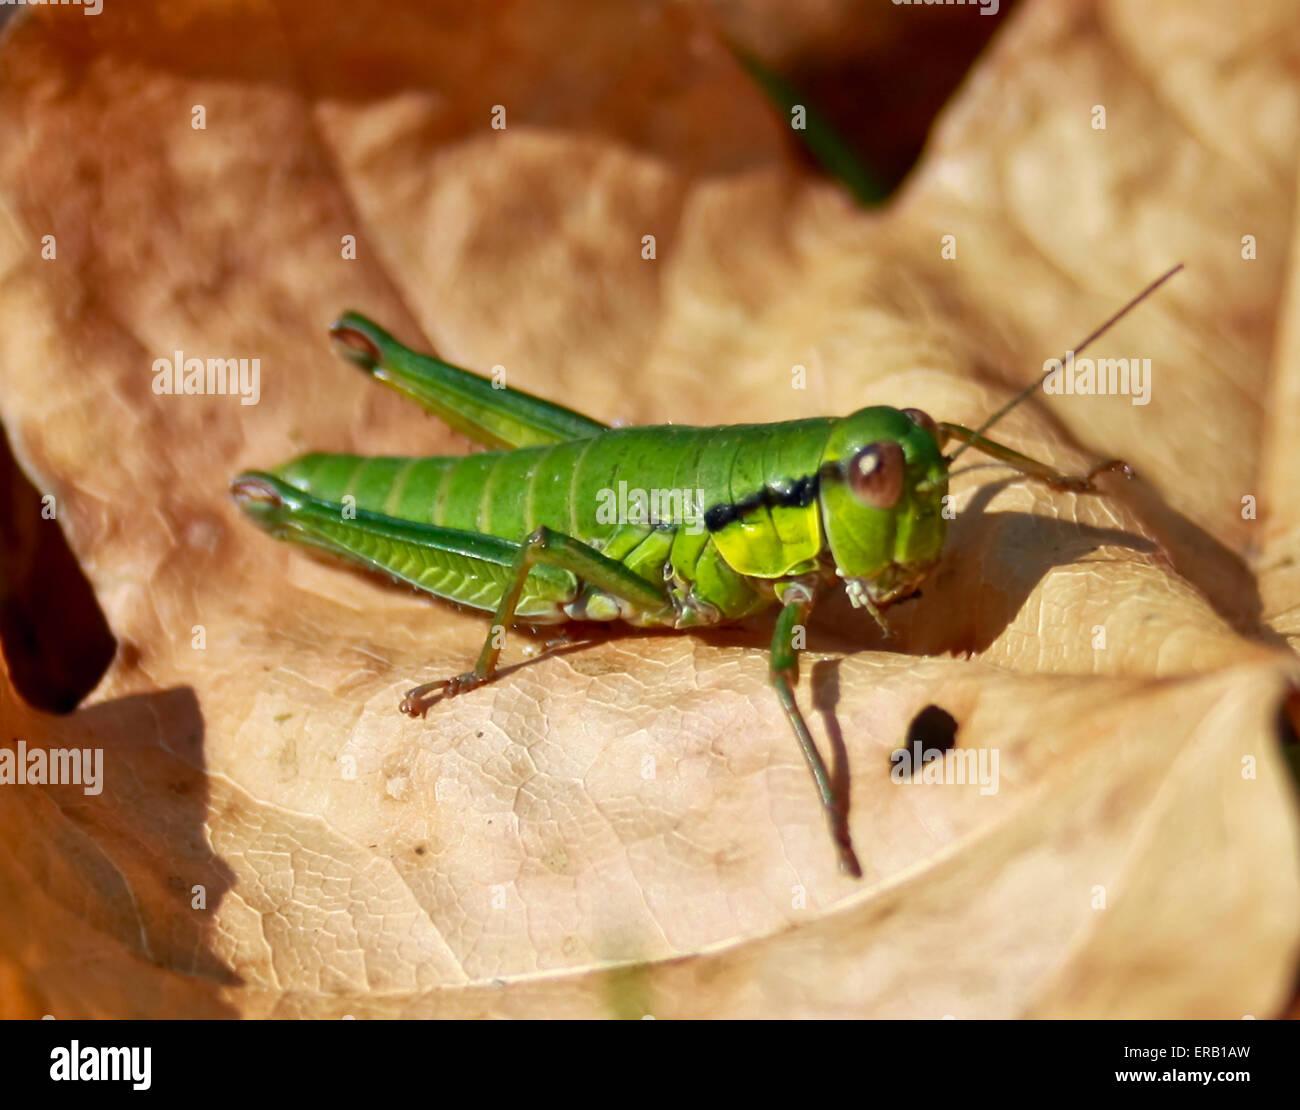 Ziemlich grün Insekt - Tettigonia Viridissima. Stockbild